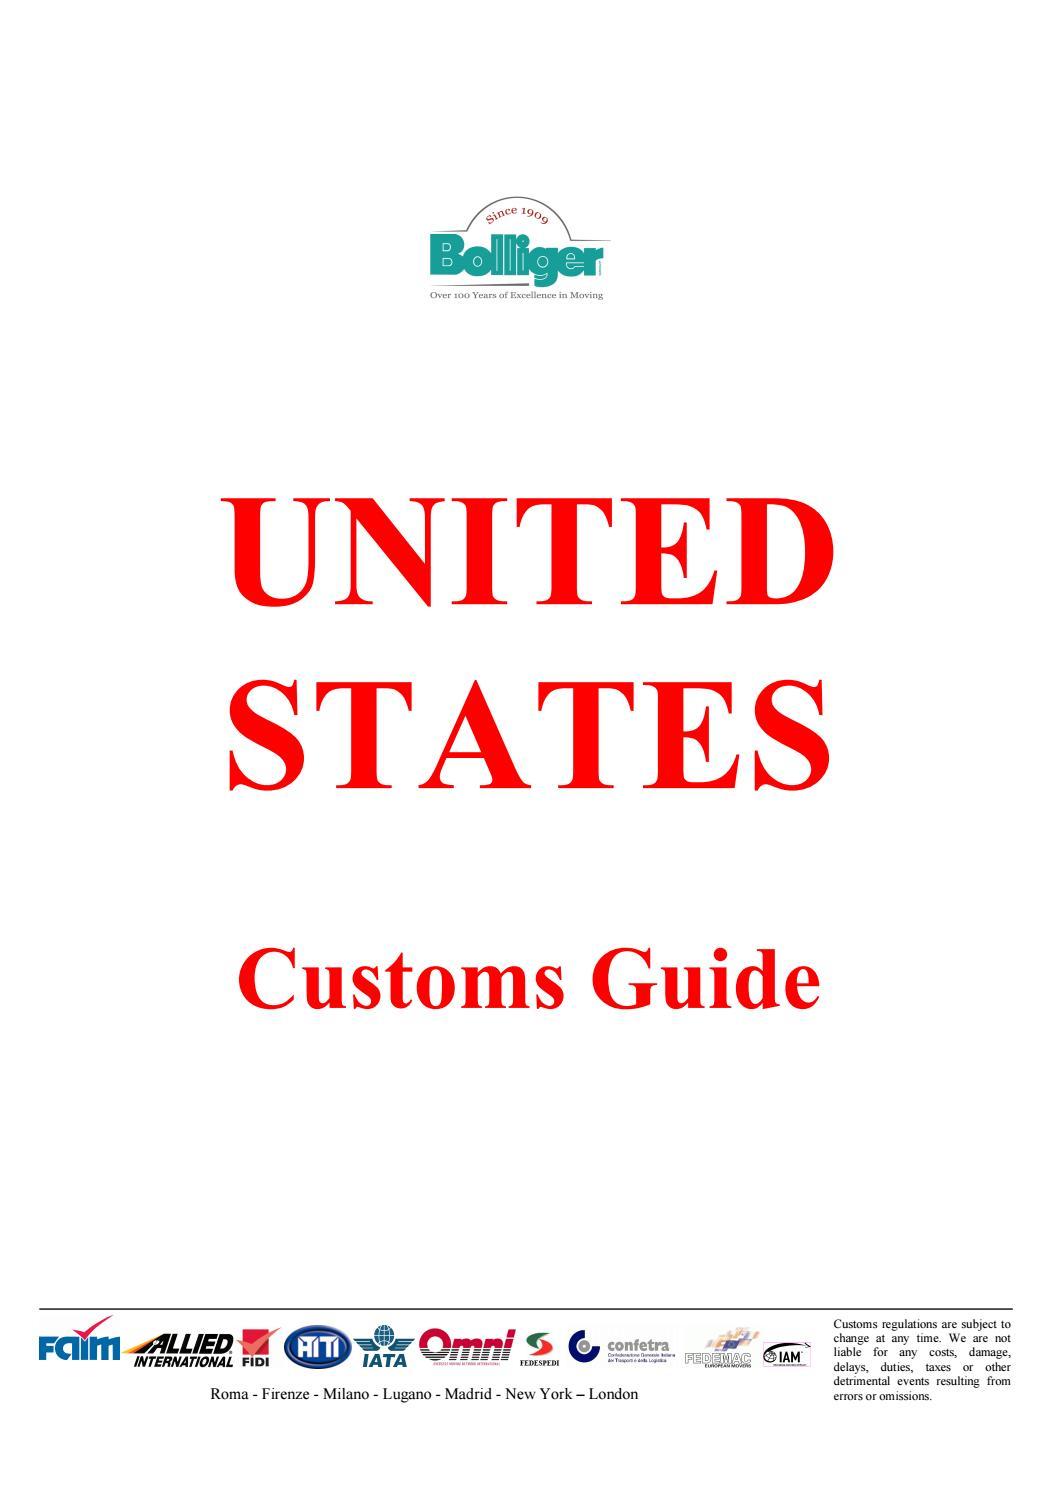 us customs guide by bolliger uk ltd issuu rh issuu com Brand Guidelines.pdf Brand Strategy